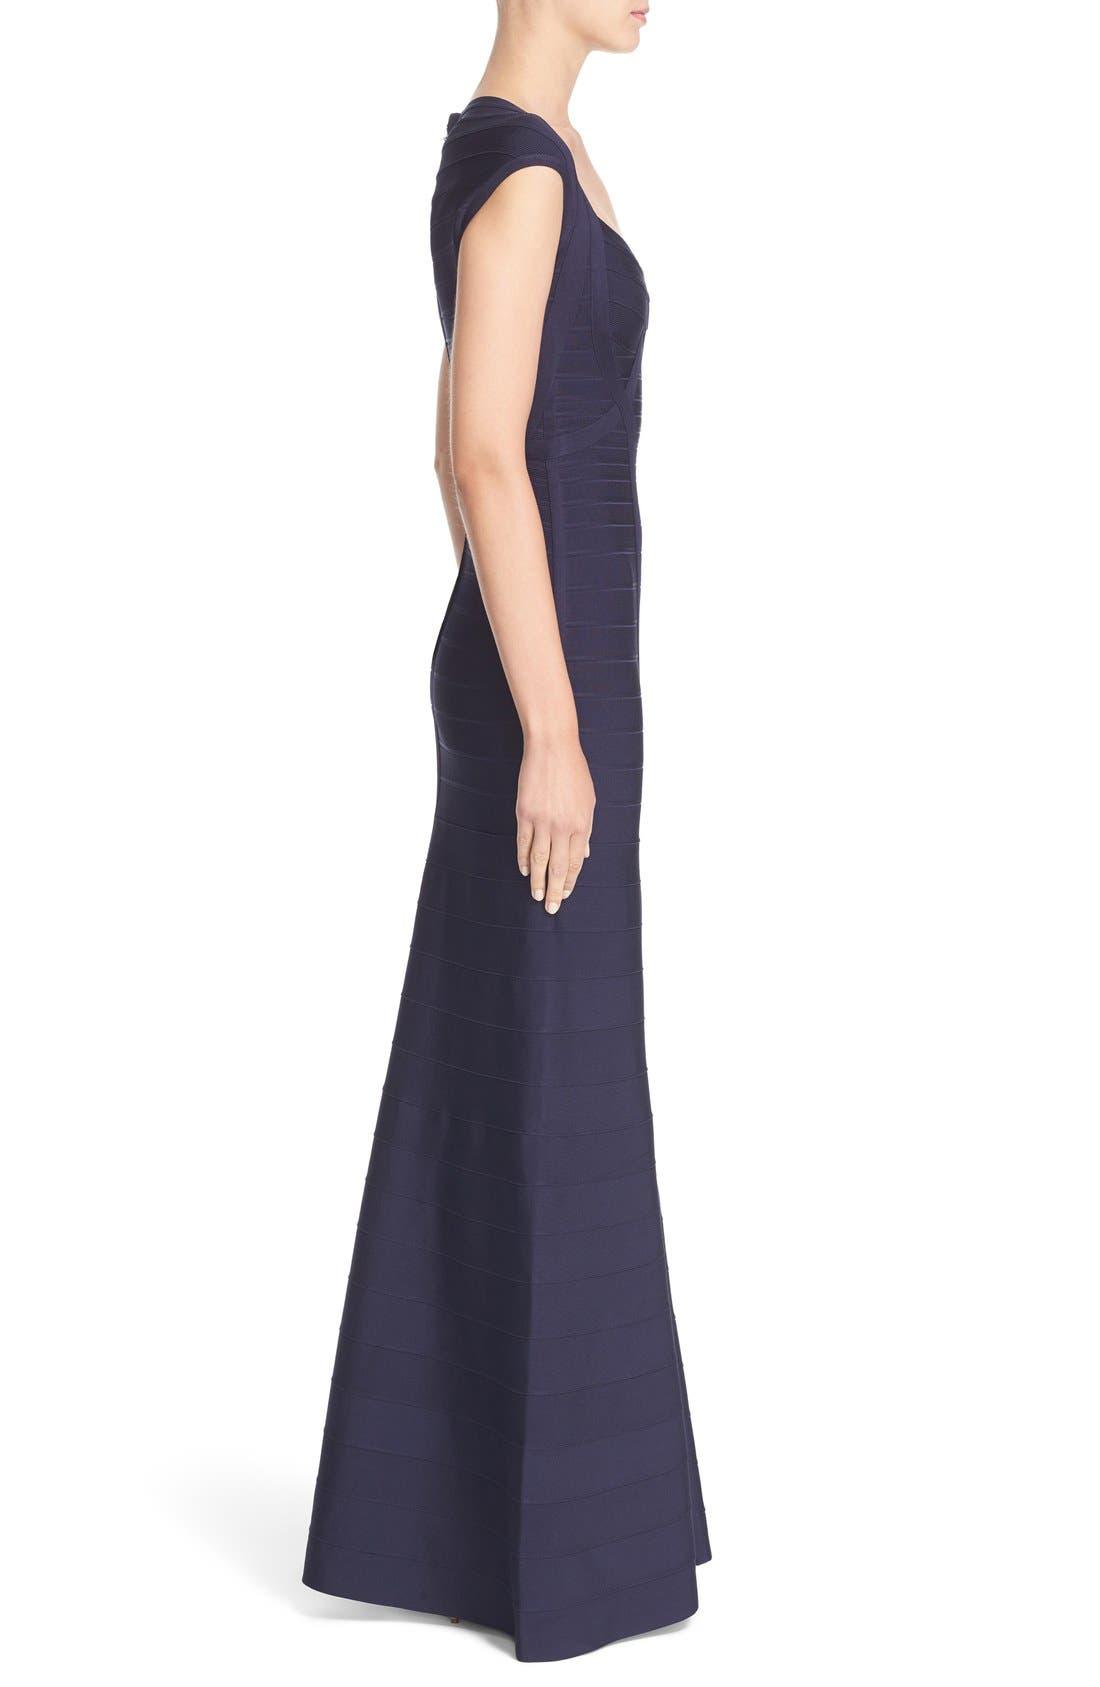 HERVE LEGER,                             'Catarina' Mermaid Bandage Gown,                             Alternate thumbnail 3, color,                             419